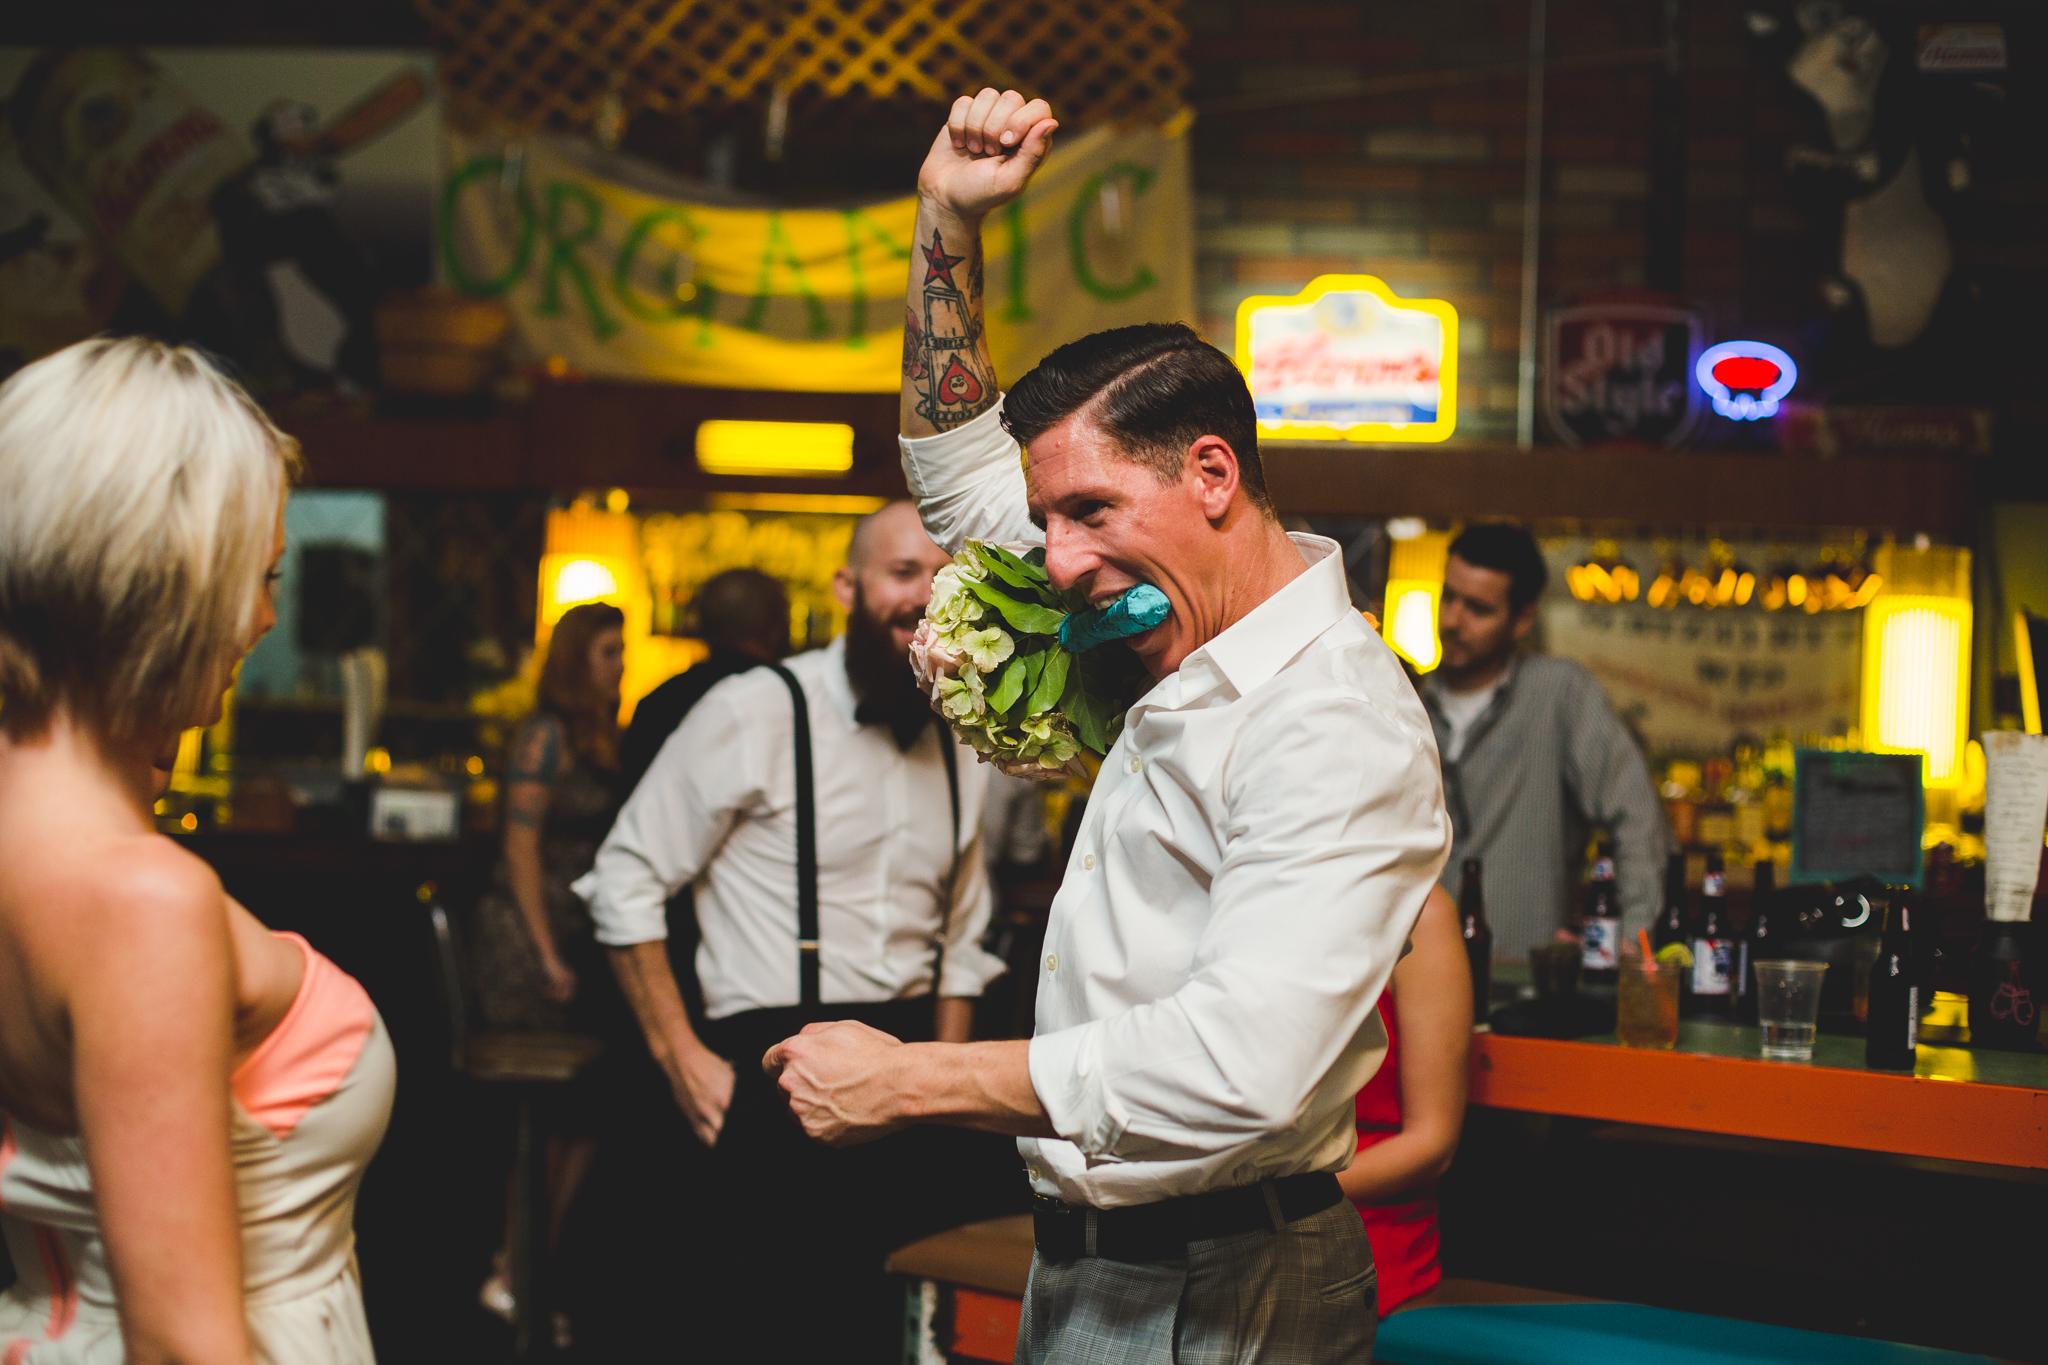 man dancing hilariously at wedding reception hj